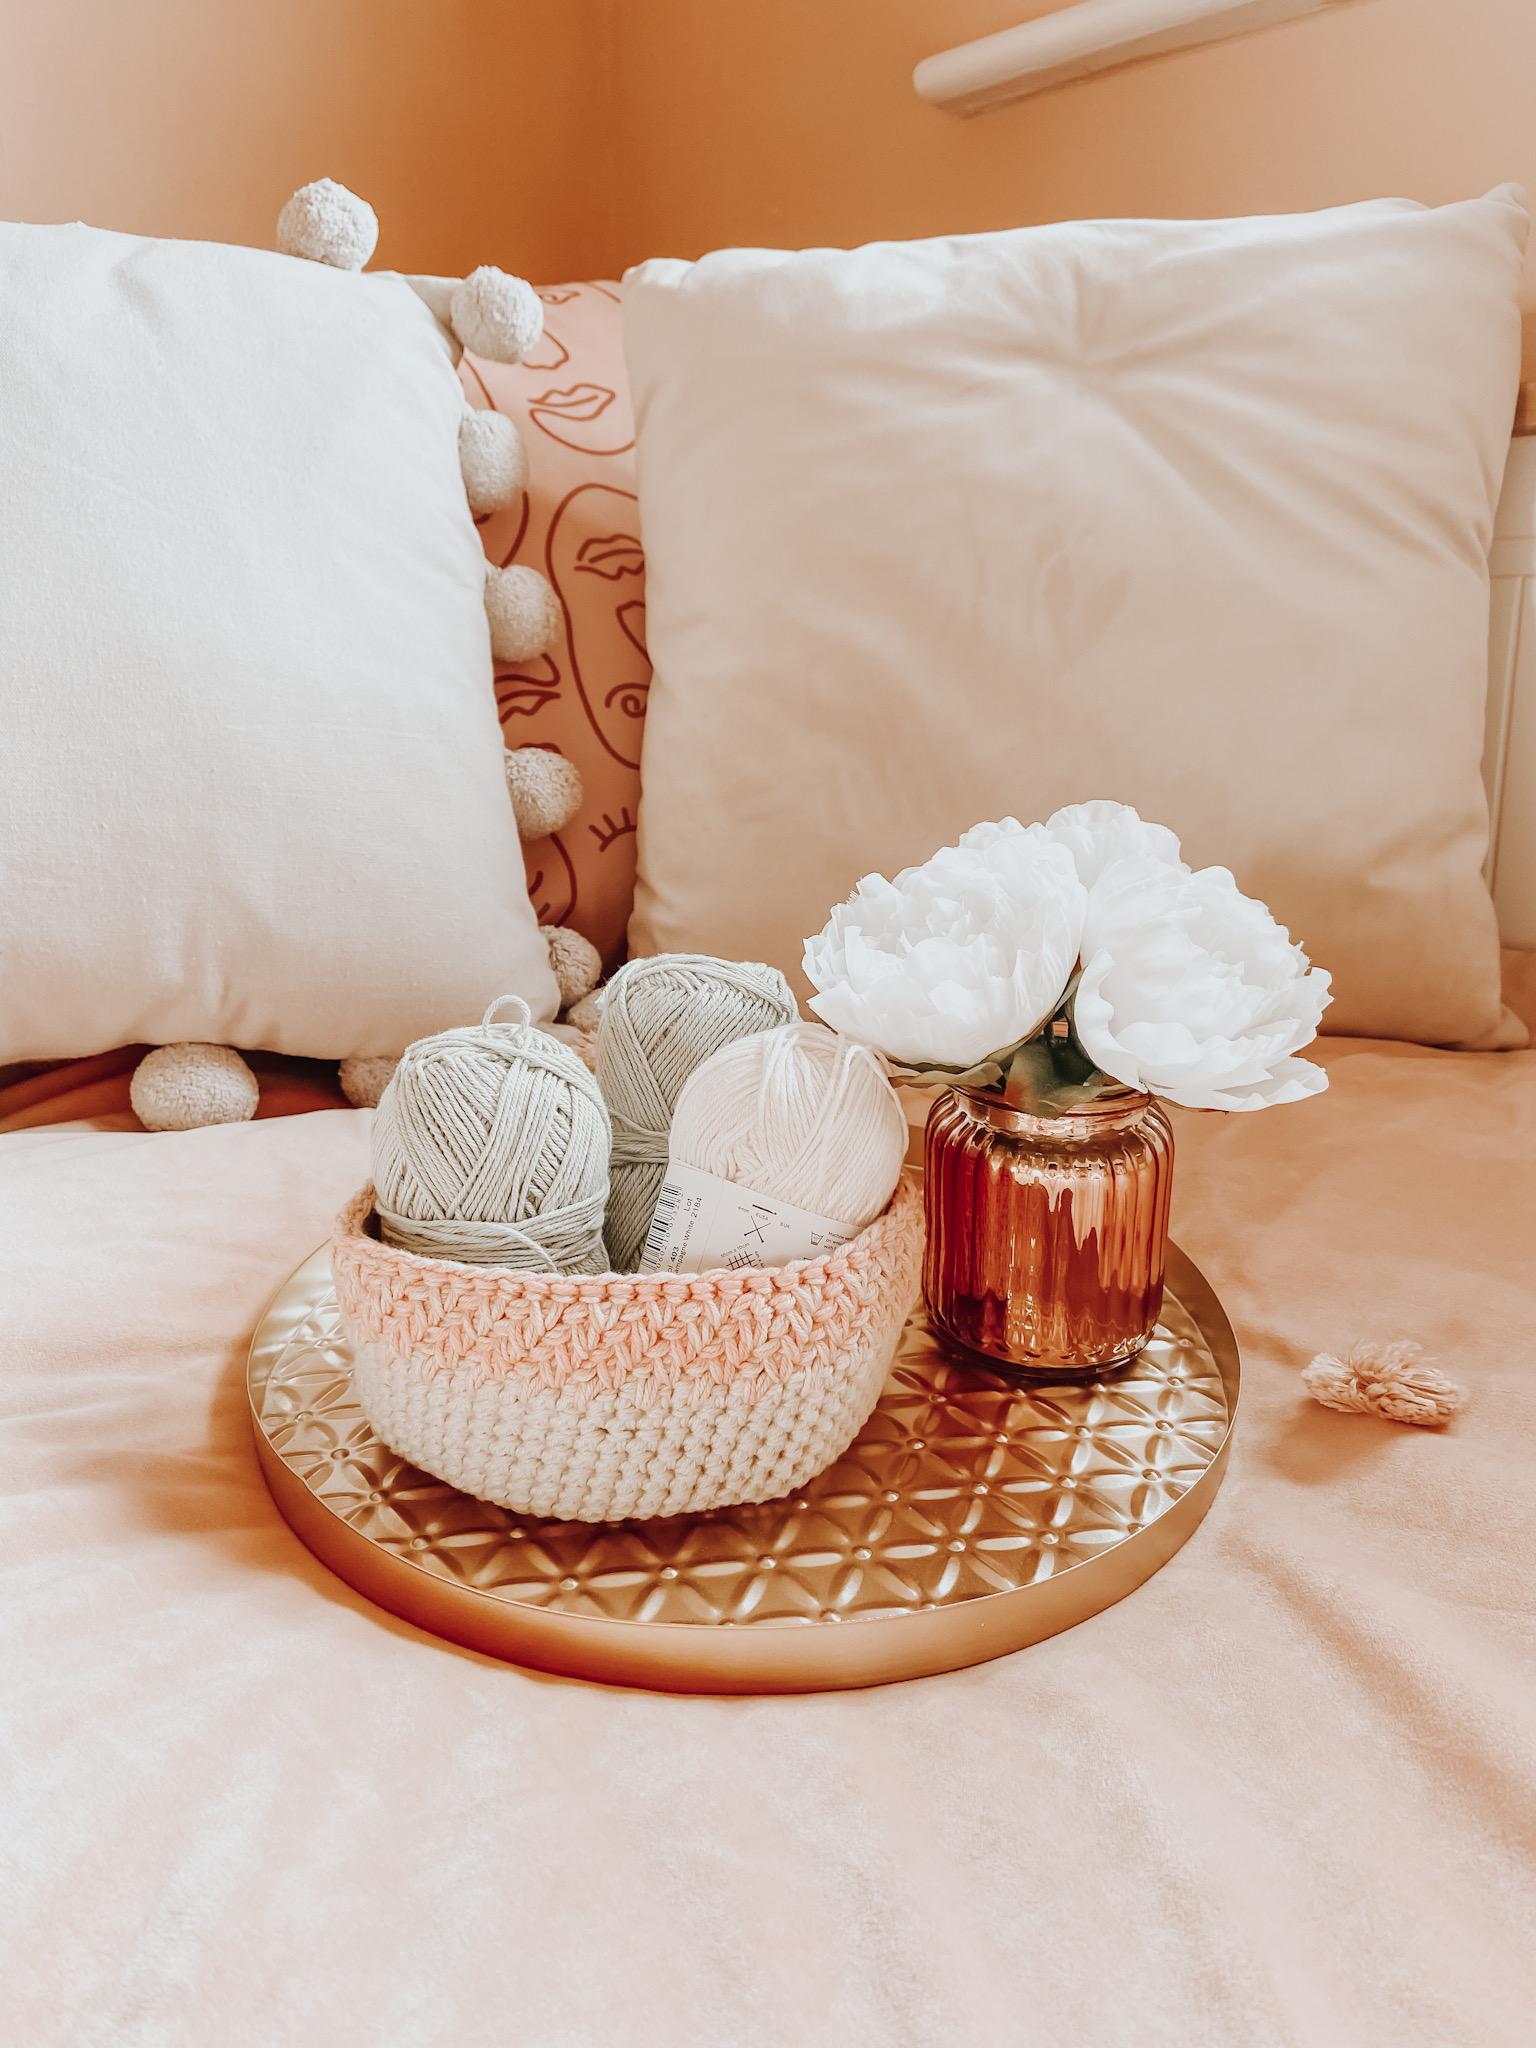 lovecraft-crochet-basket